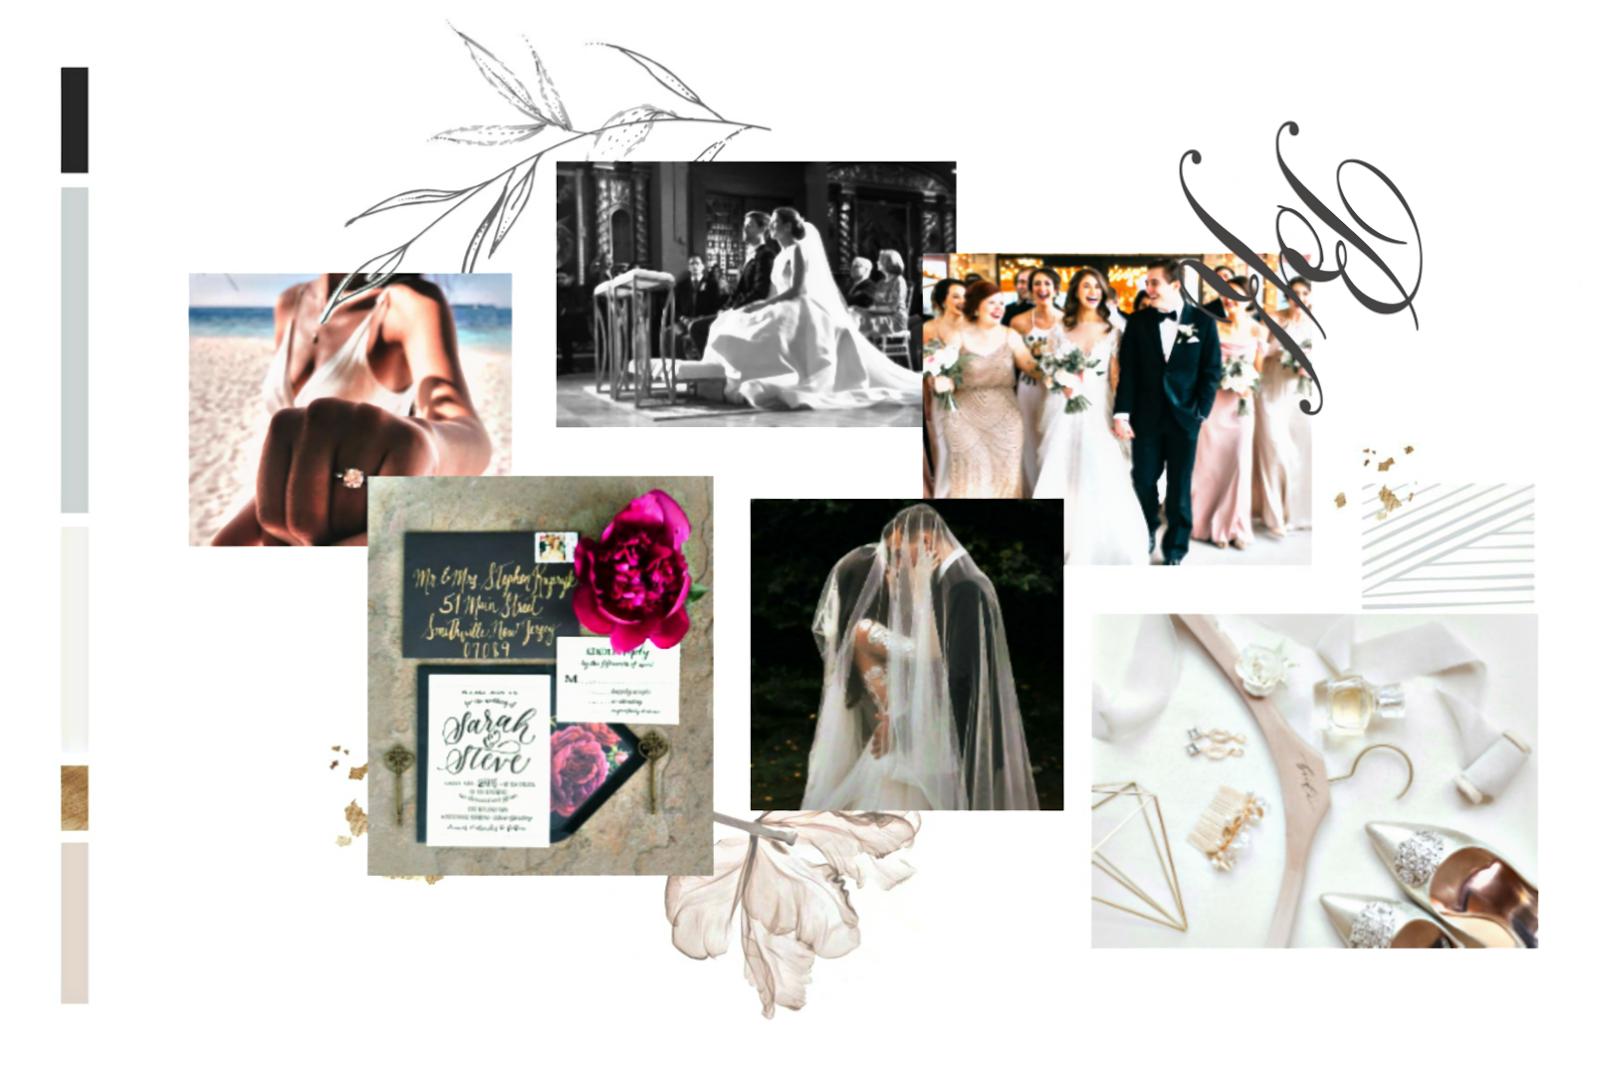 7 puntos indispensables para organizar tu boda